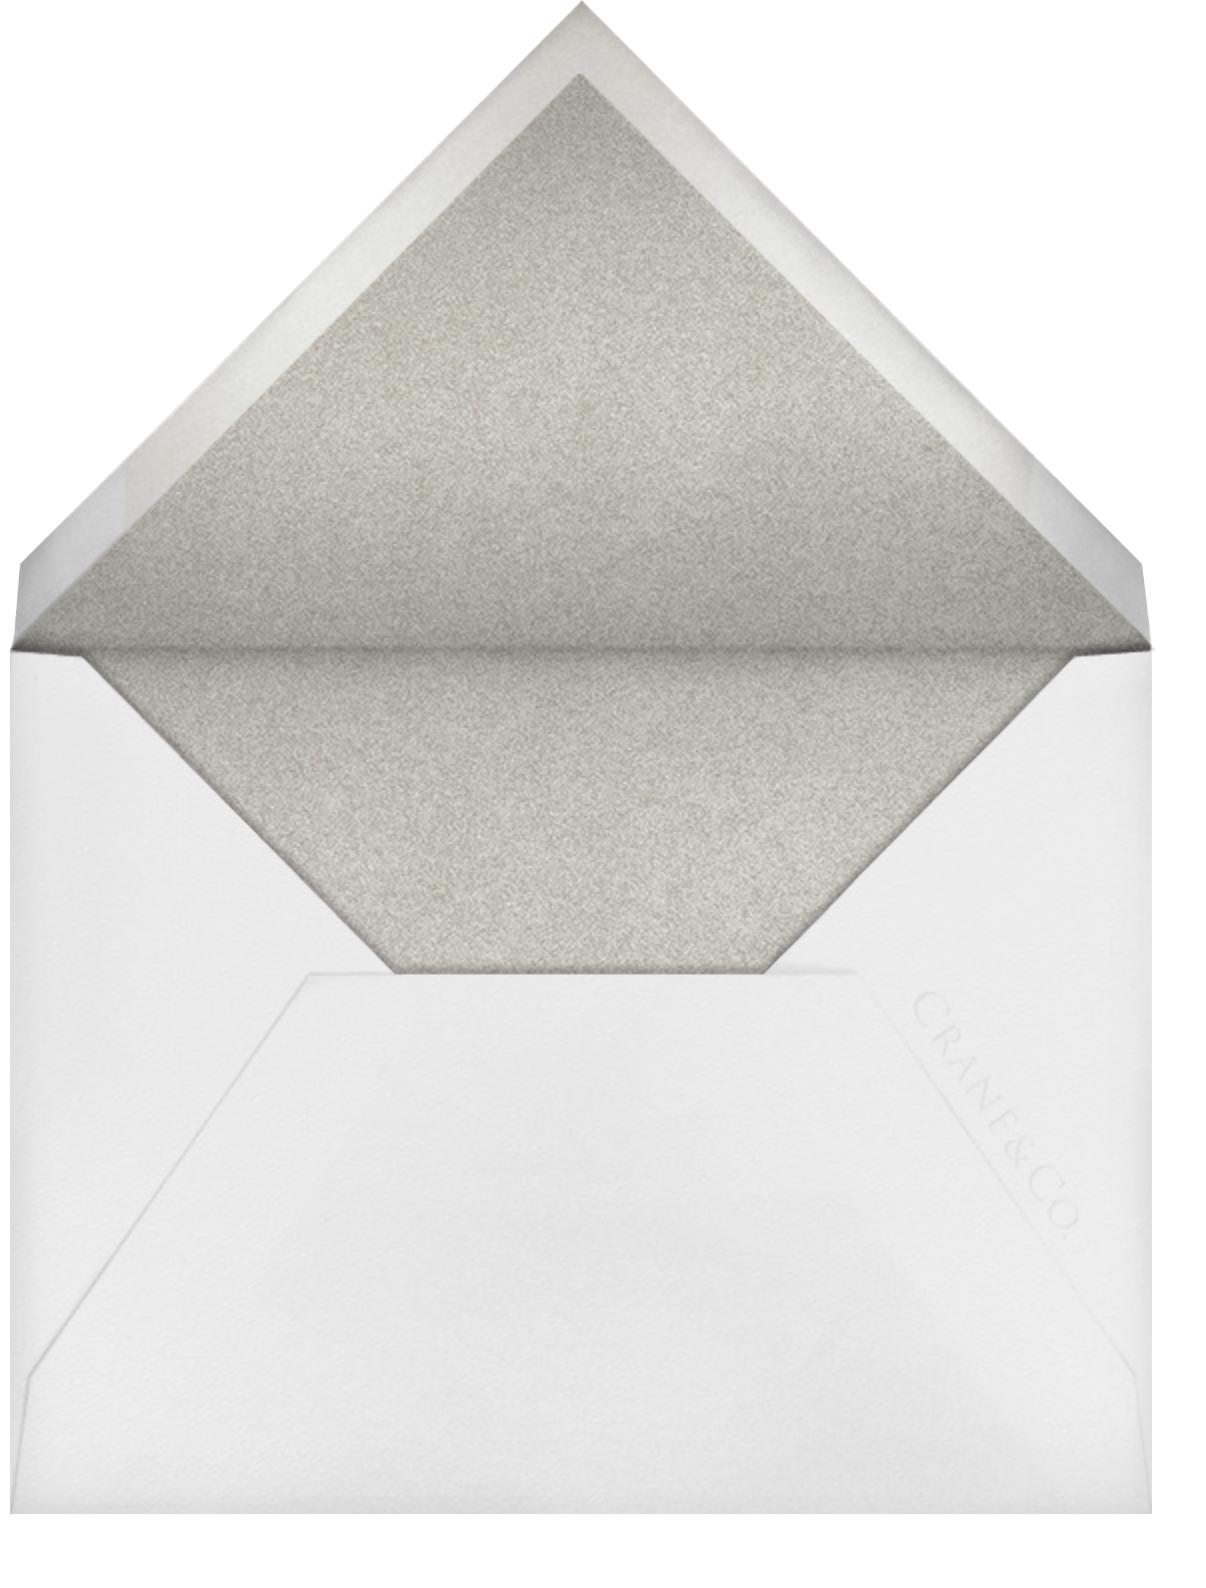 Singer (Stationery) - Platinum - Vera Wang - Personalized stationery - envelope back